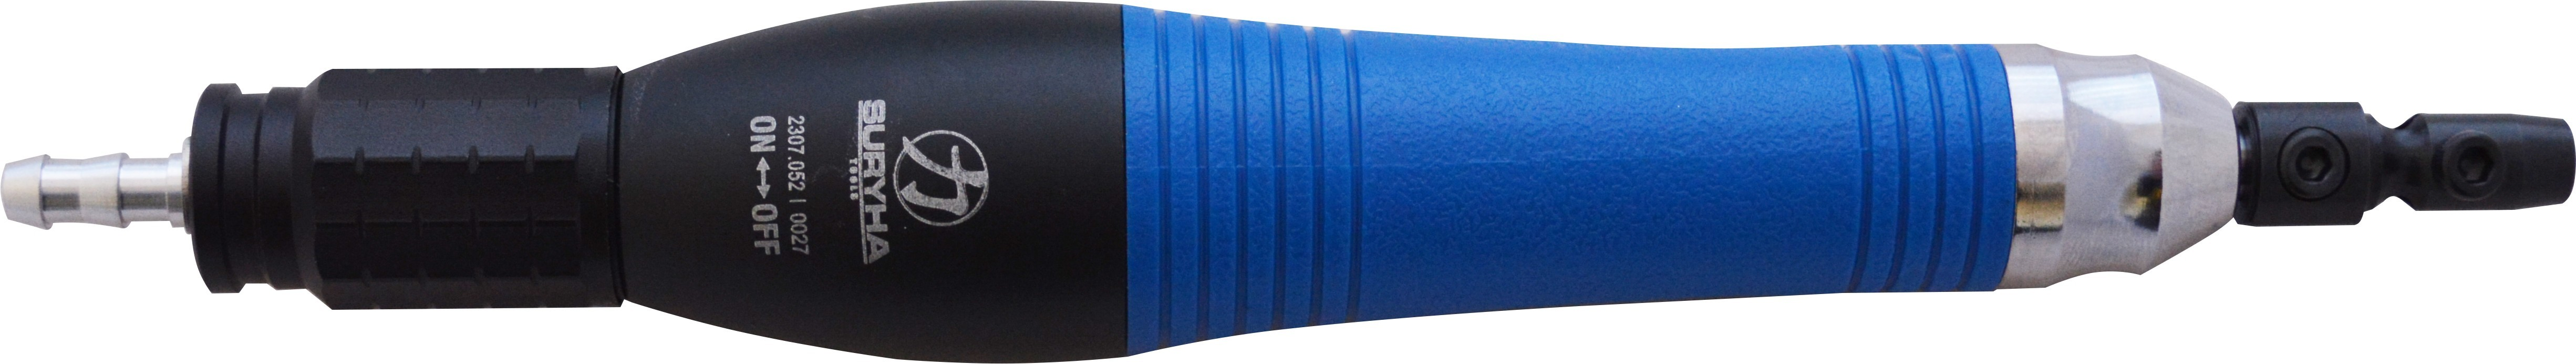 Limadora 25.000Bpm Curso 1,2mm Suryha